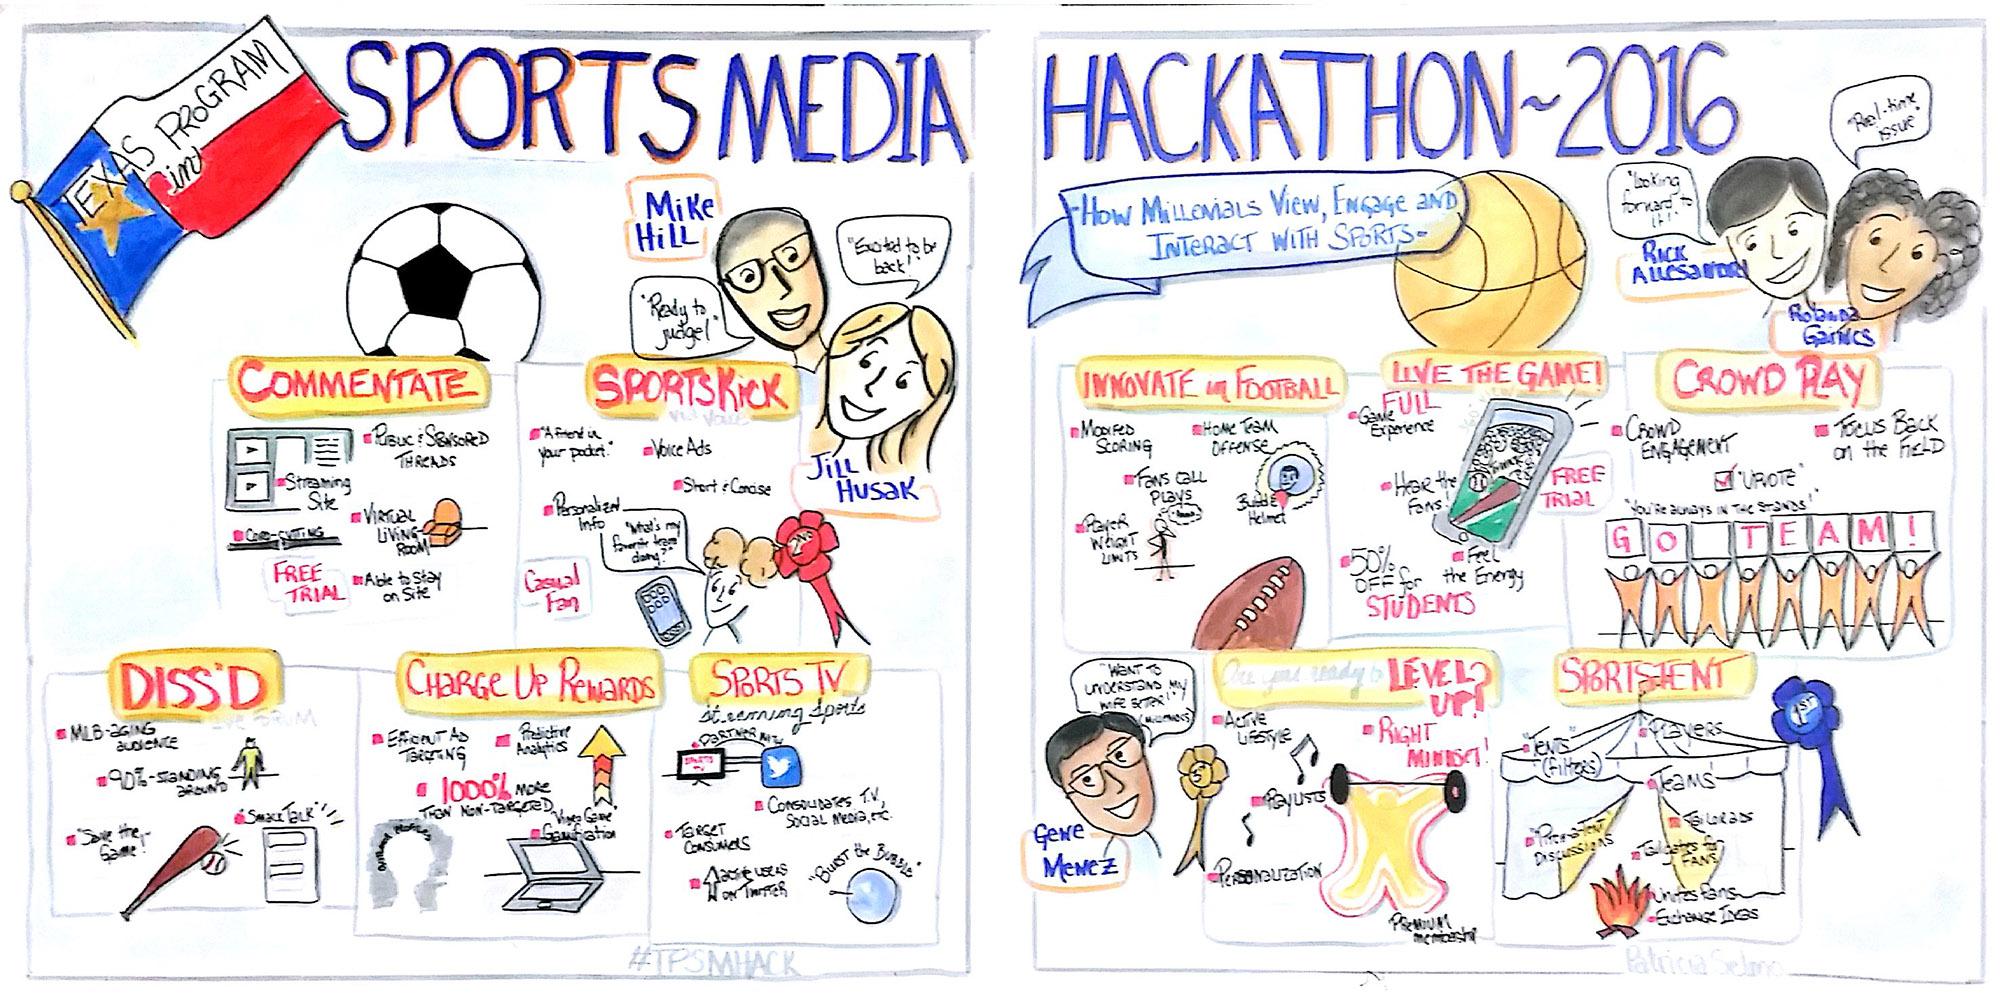 Workshop // Hackathon